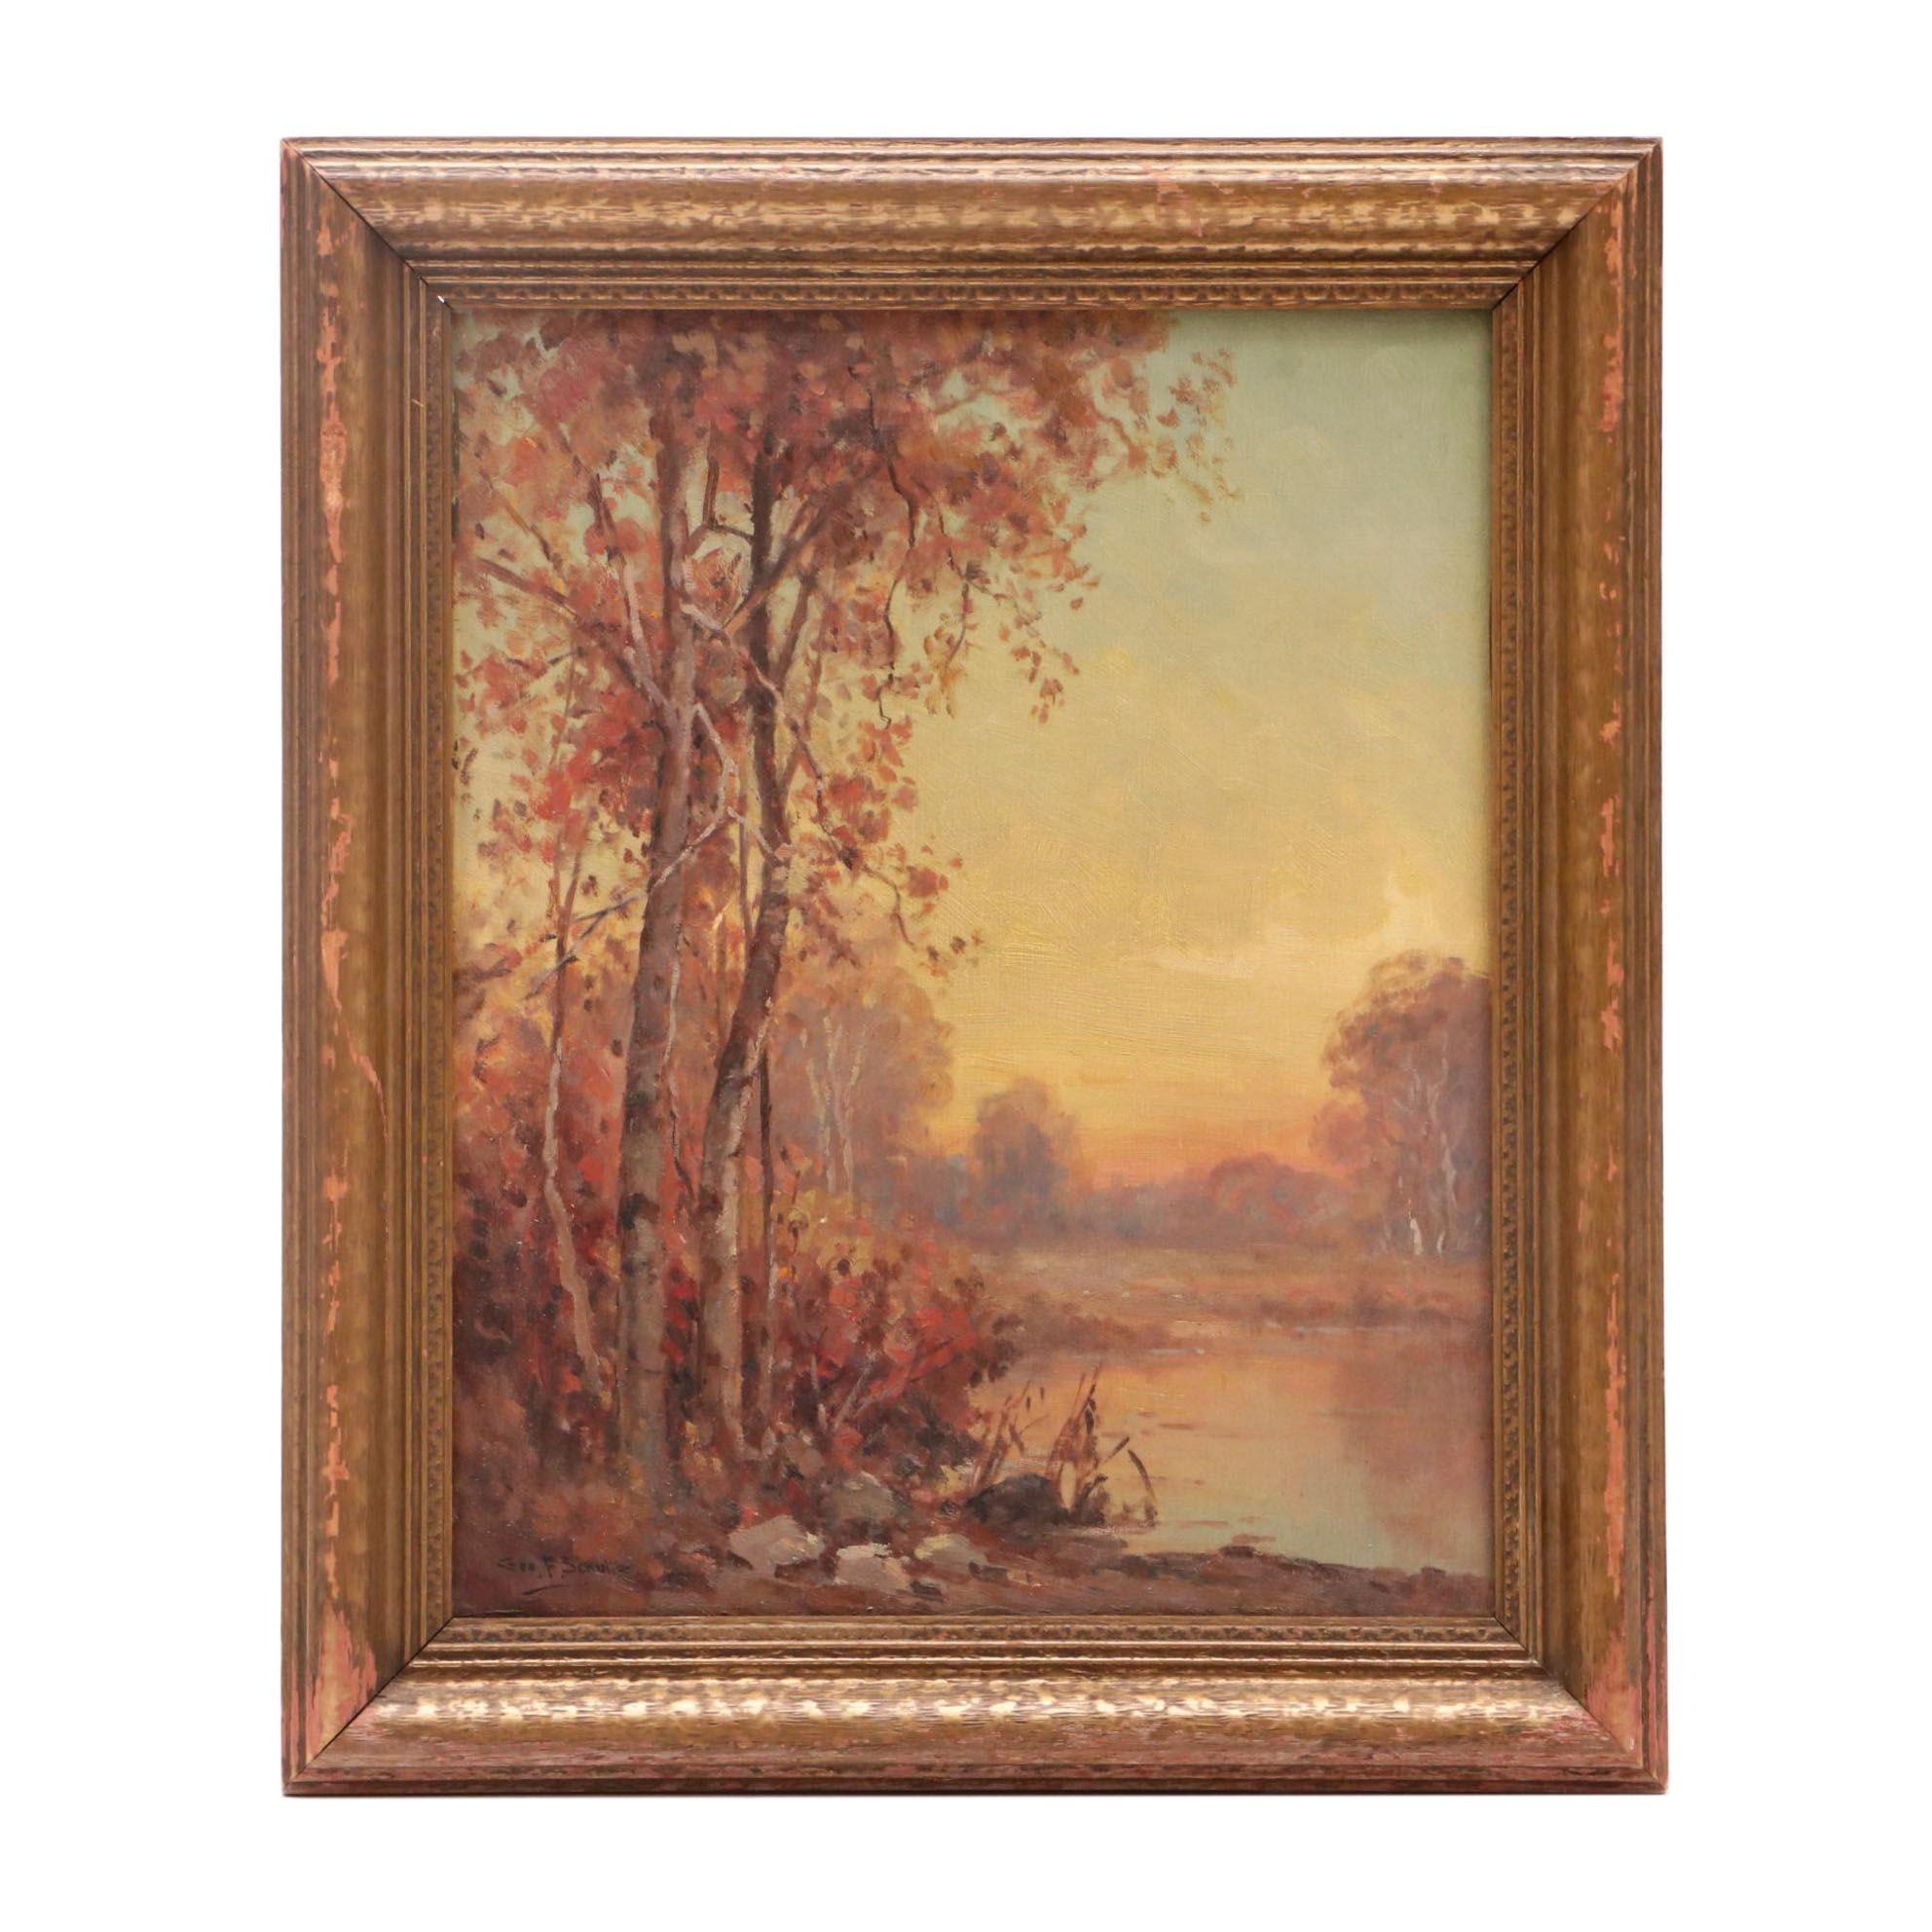 George F. Schultz Landscape Oil Painting